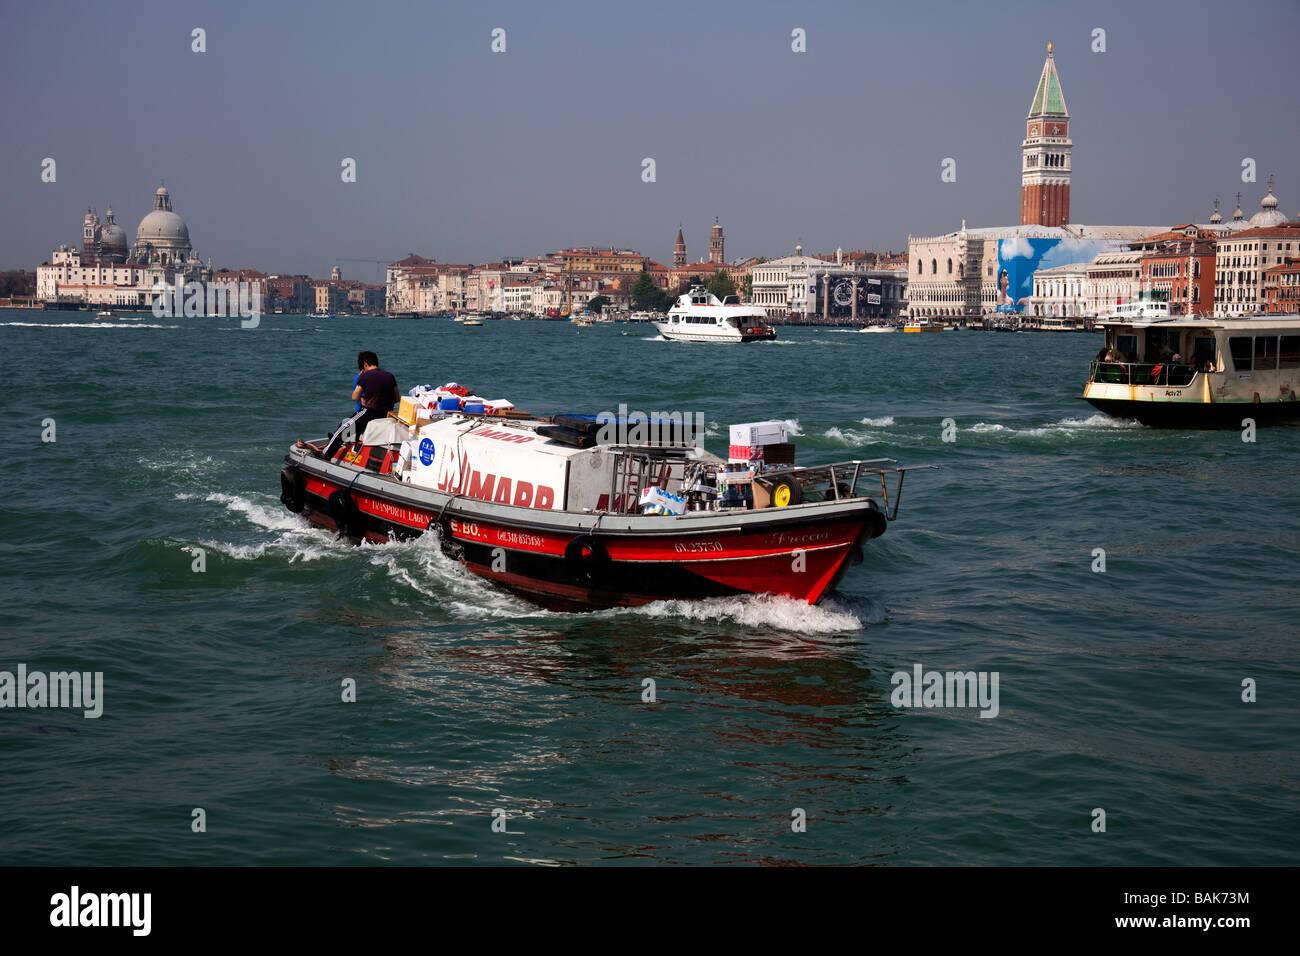 Bacino di San Marco Venice Italy transport - Stock Image